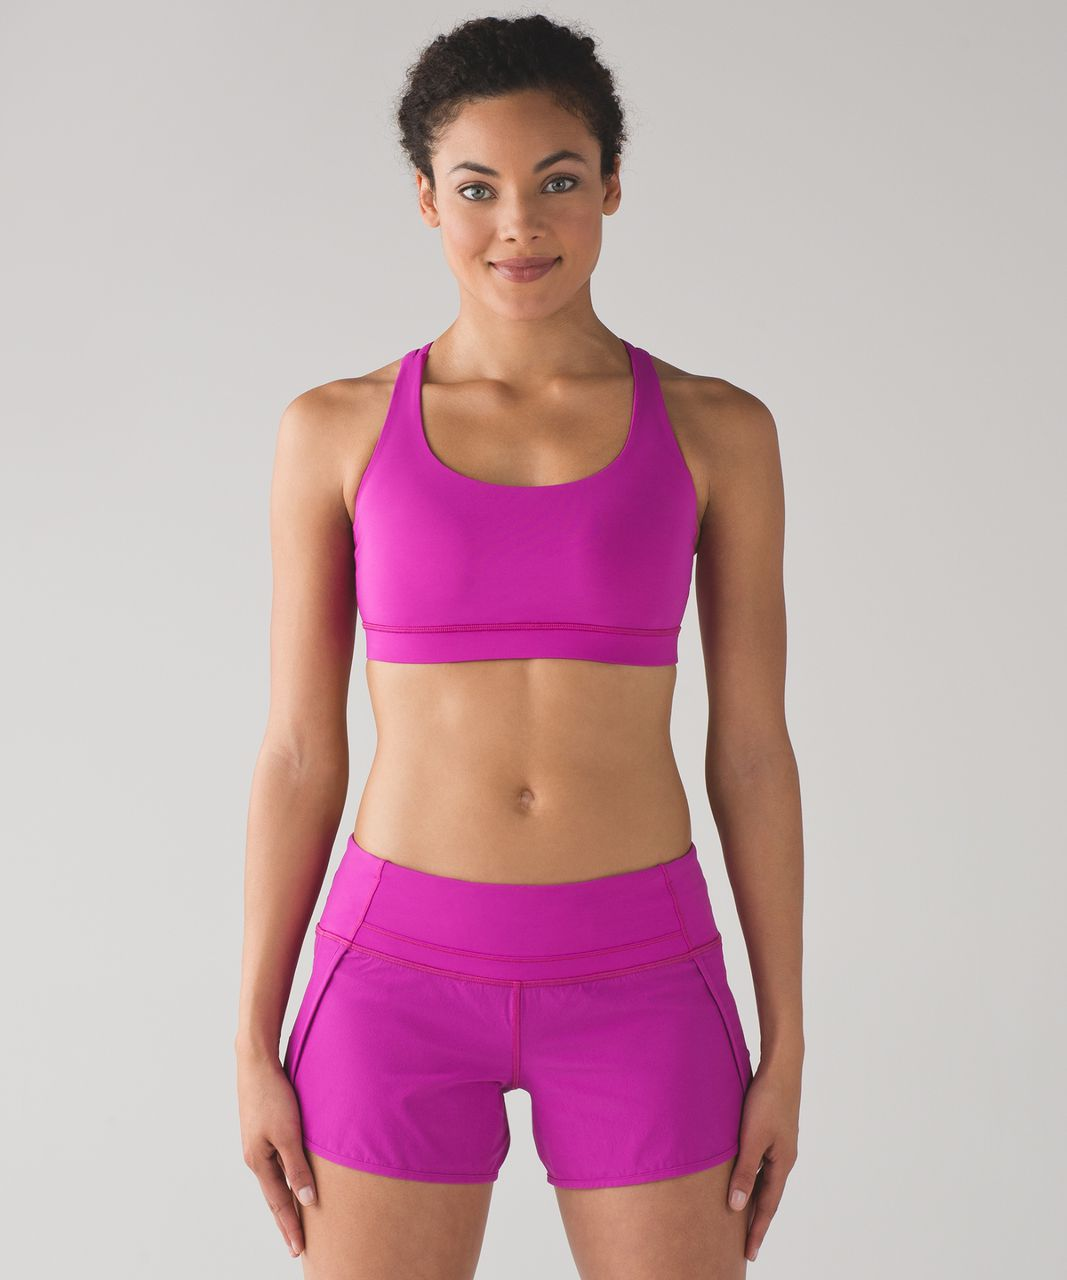 Lululemon Energy Bra - Polar Pink